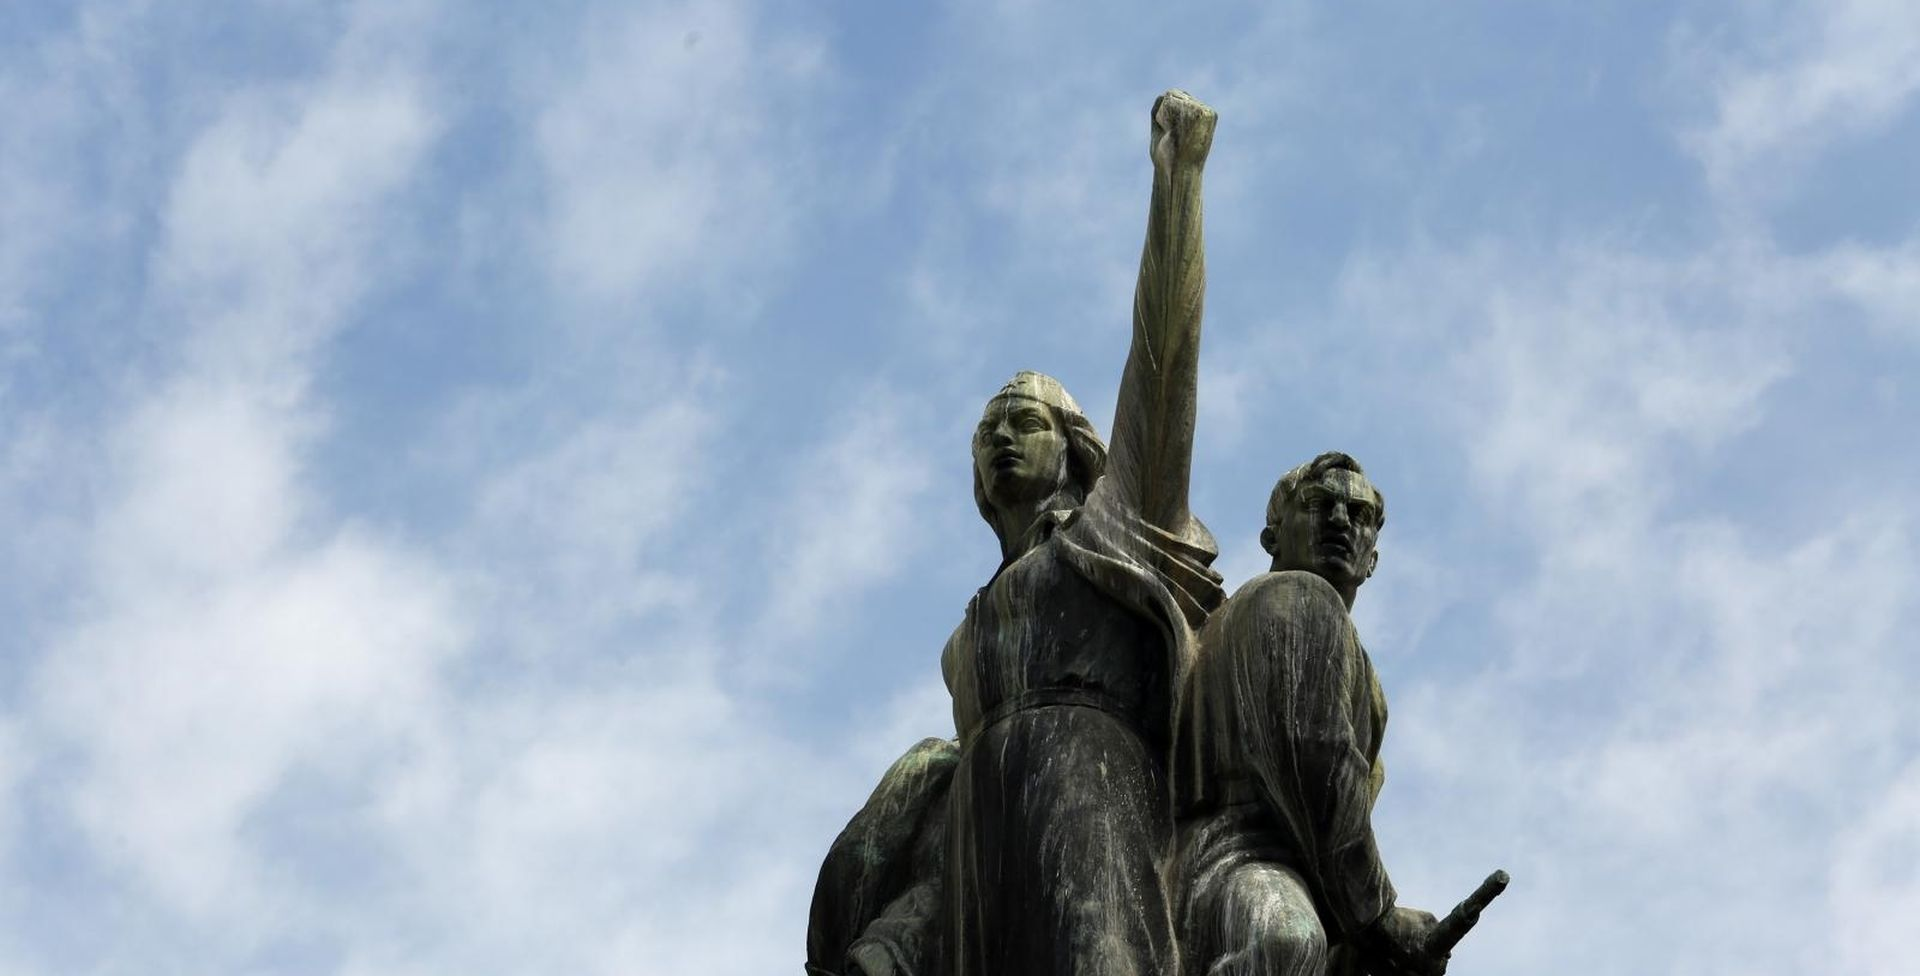 FELJTON: Zaboravljeni junaci antifašističke borbe